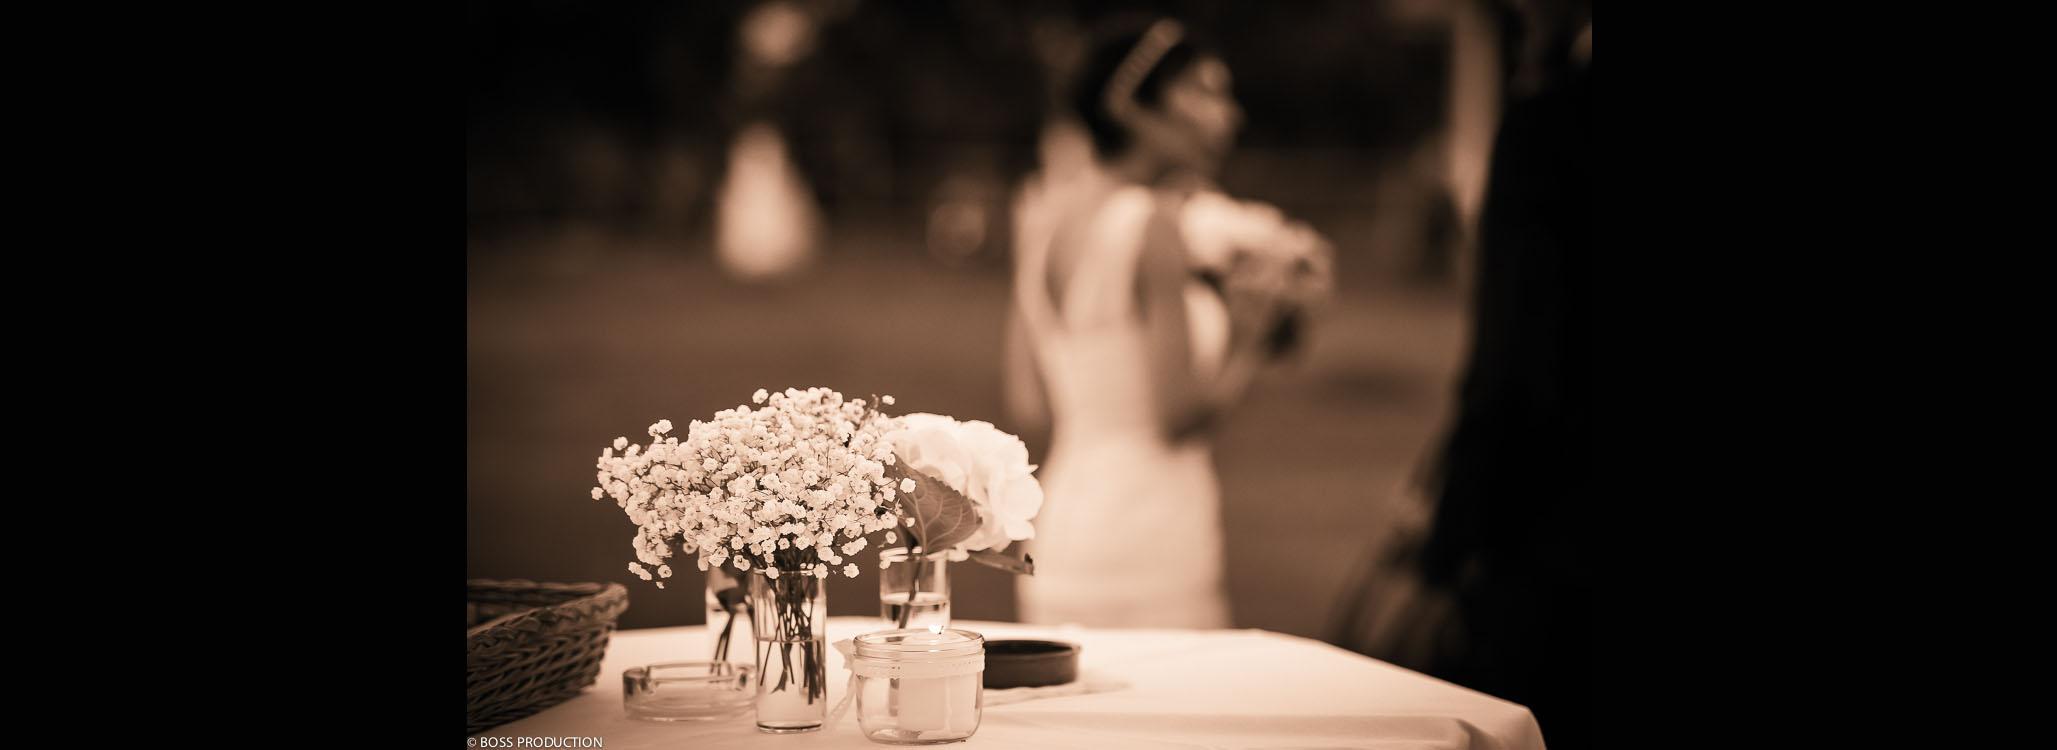 BOSS-PROD-MARIAGE-33.jpg